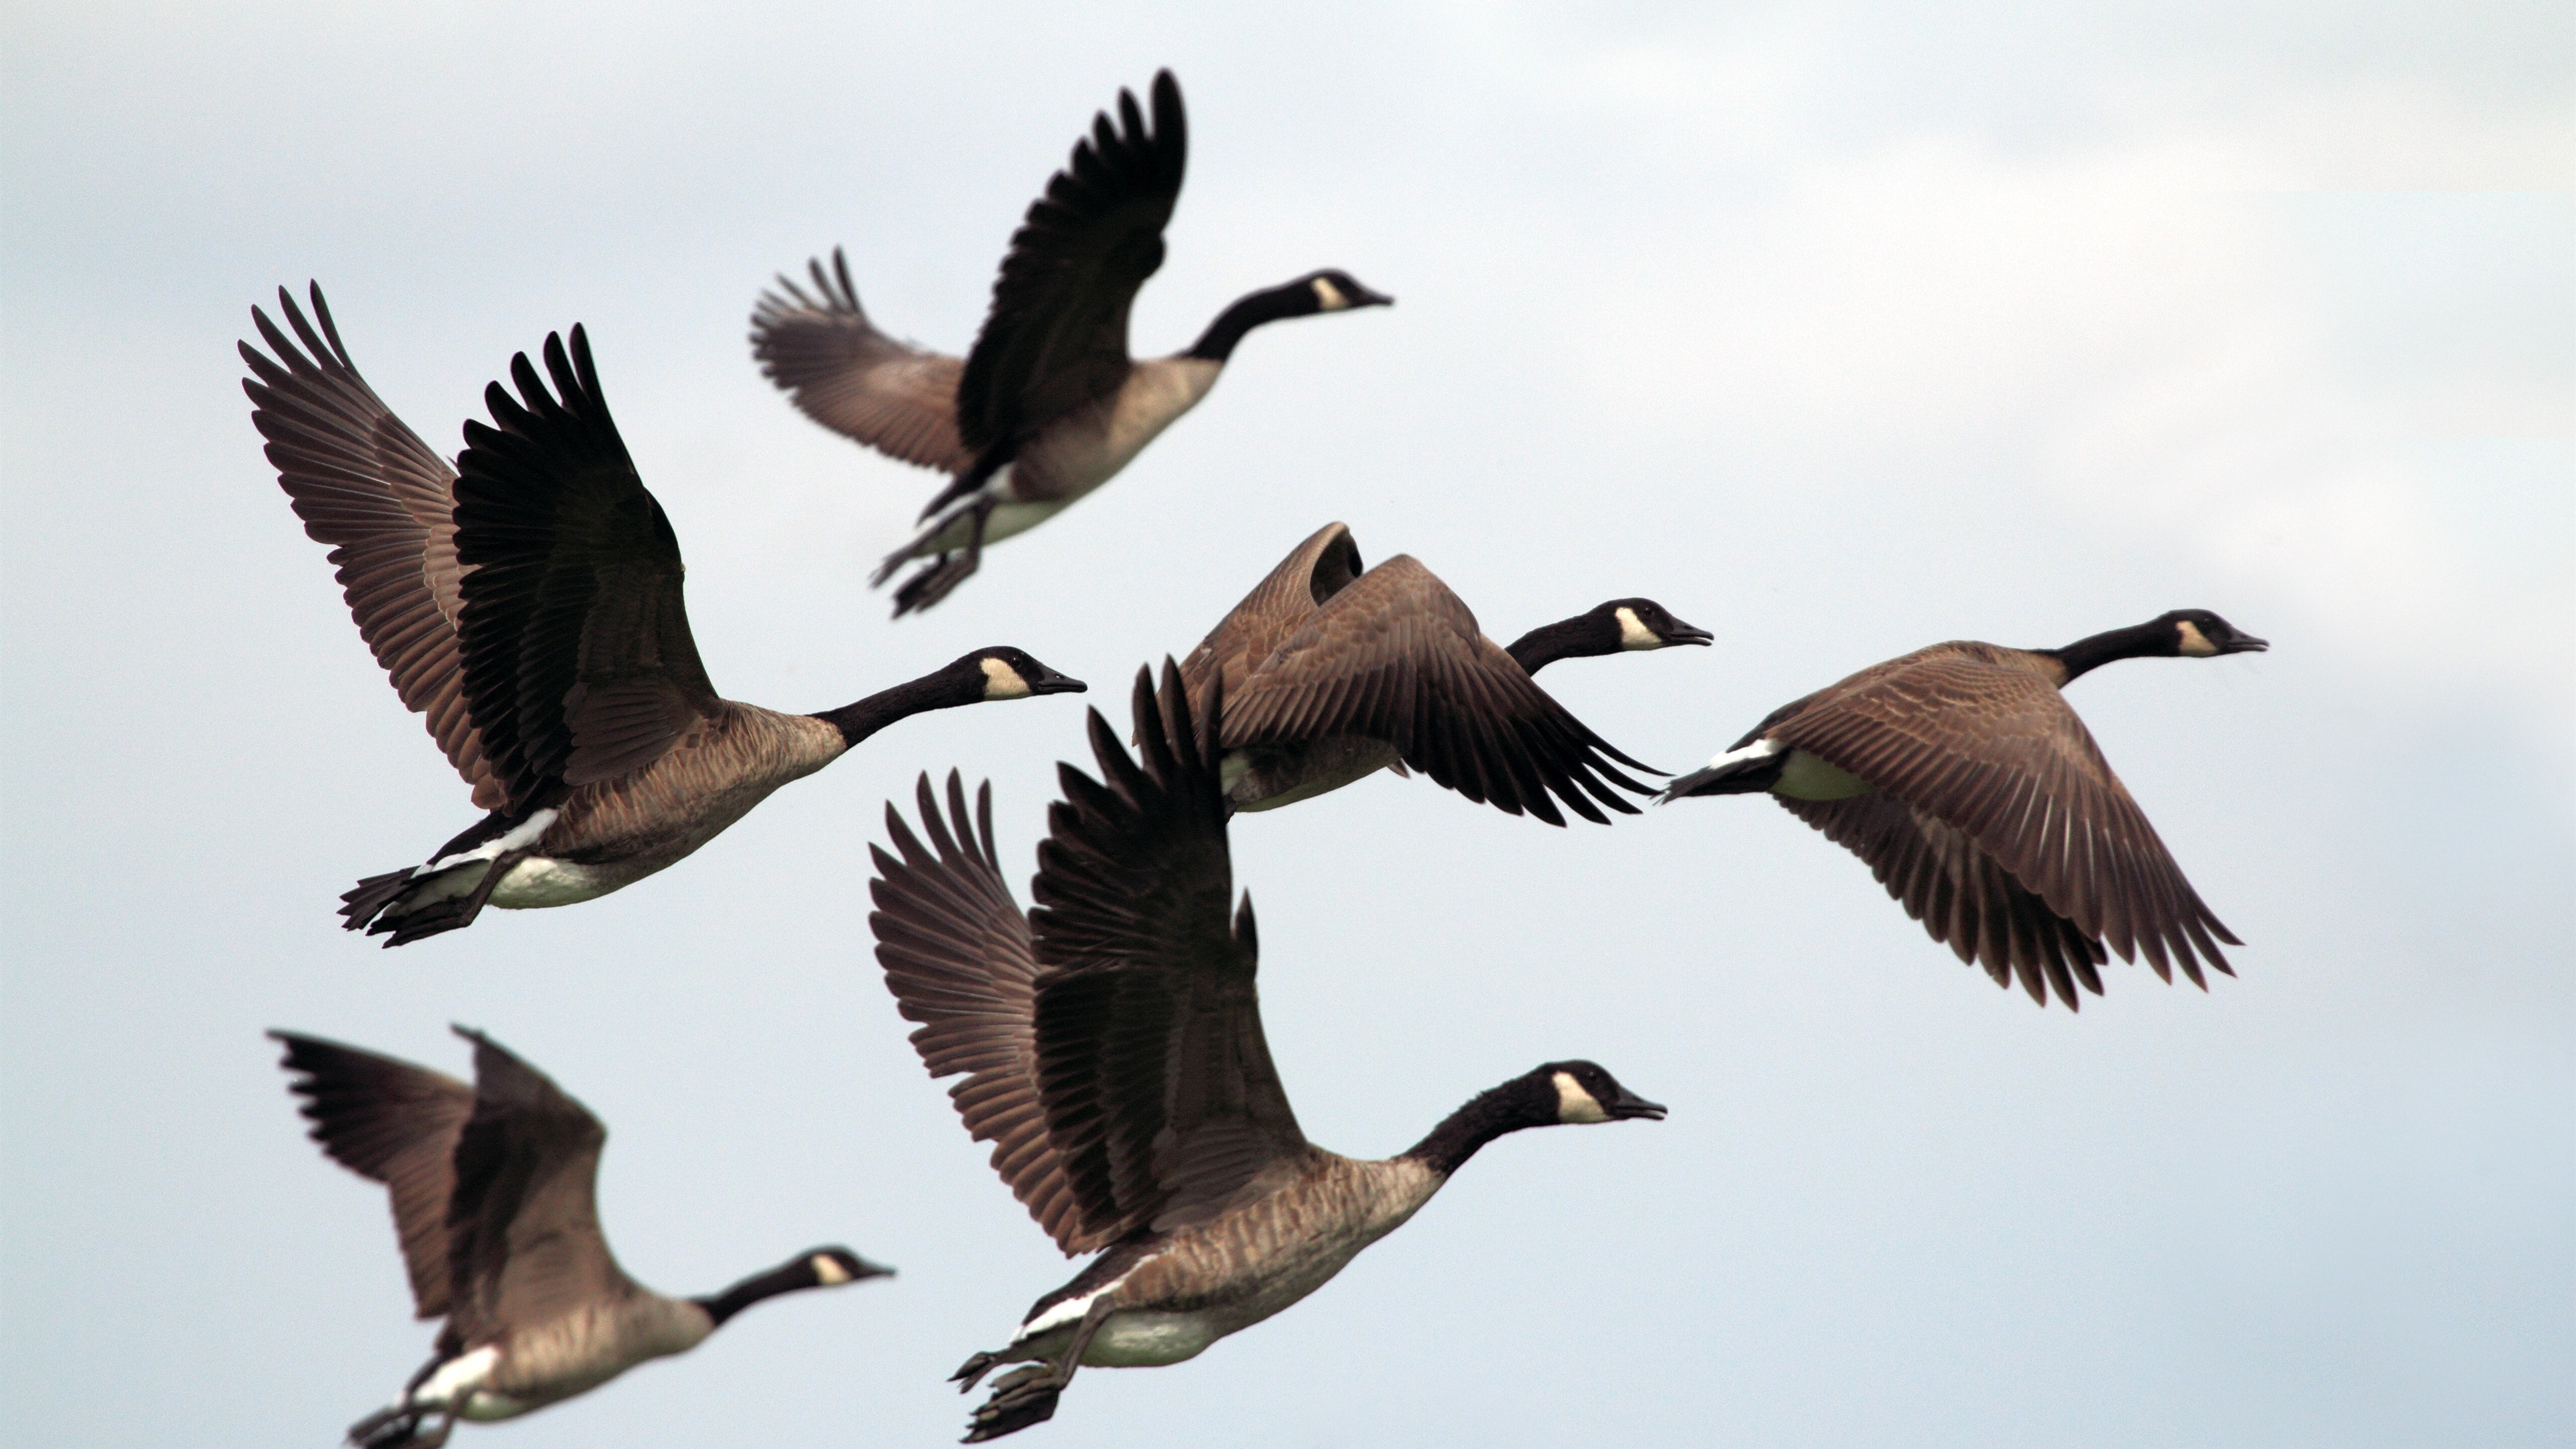 Flocks Of Bird Flying 5k Photo Hd Wallpapers